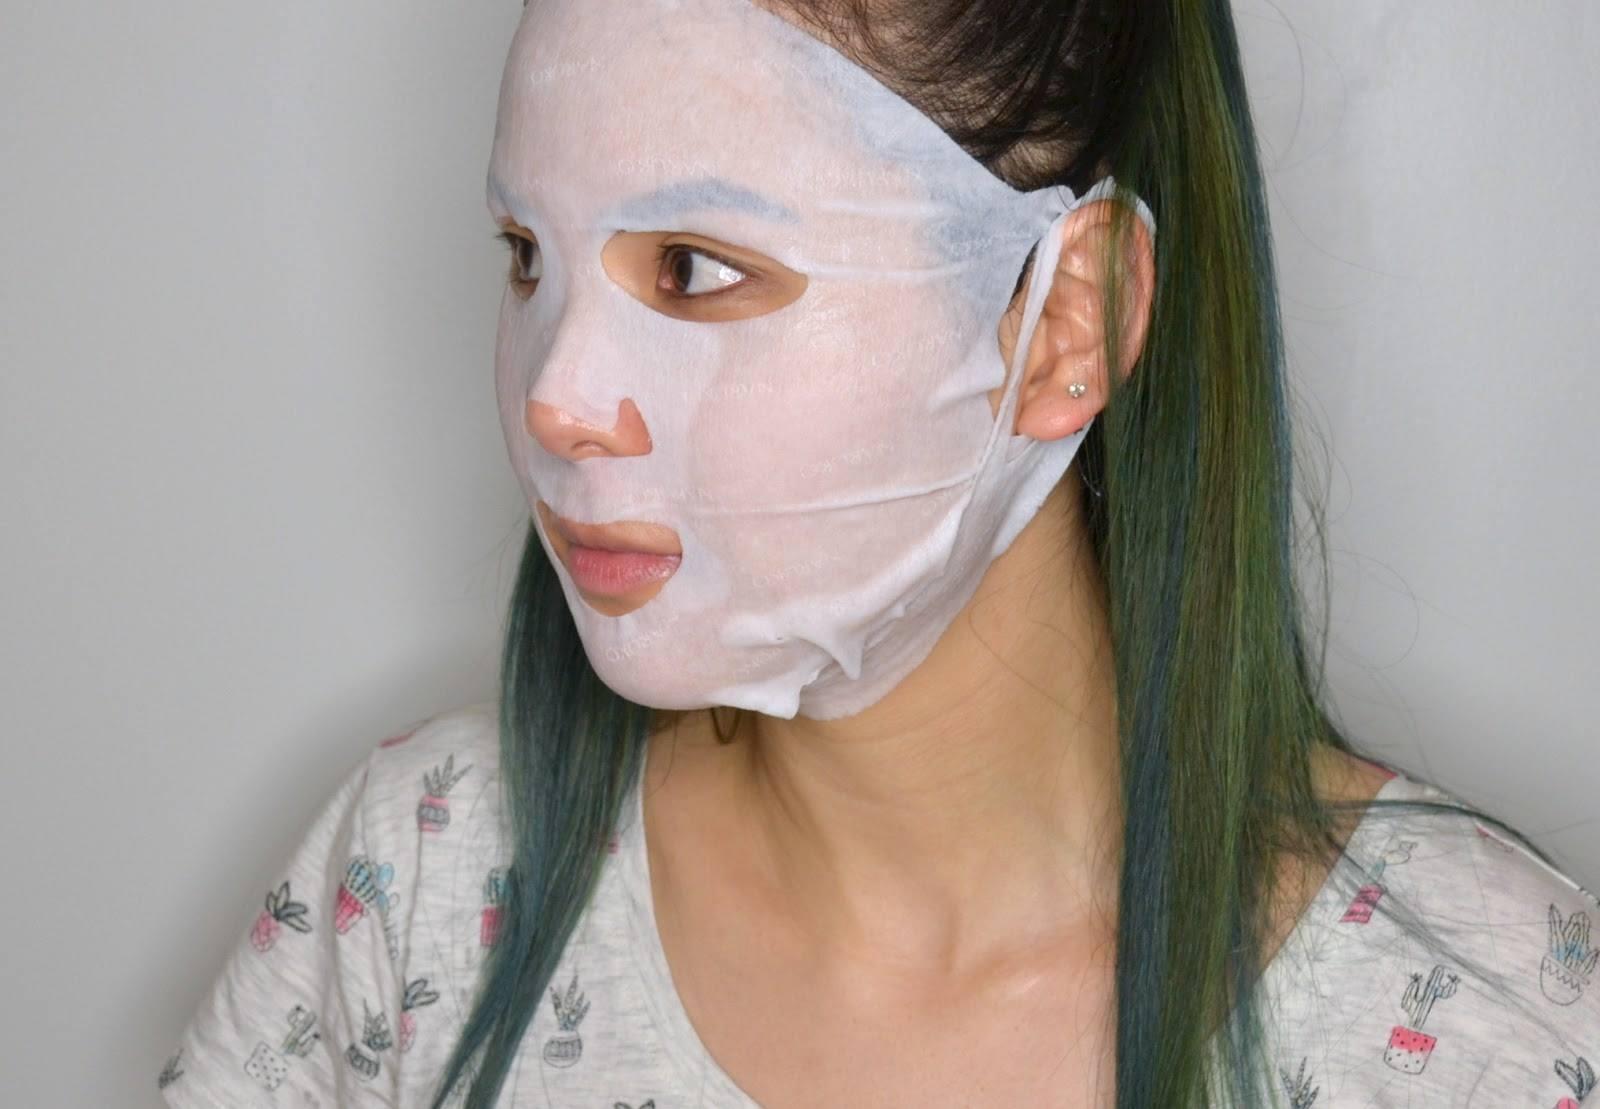 NARUKO Taiwan Magnolia Brightening & Firming Mask EX 2